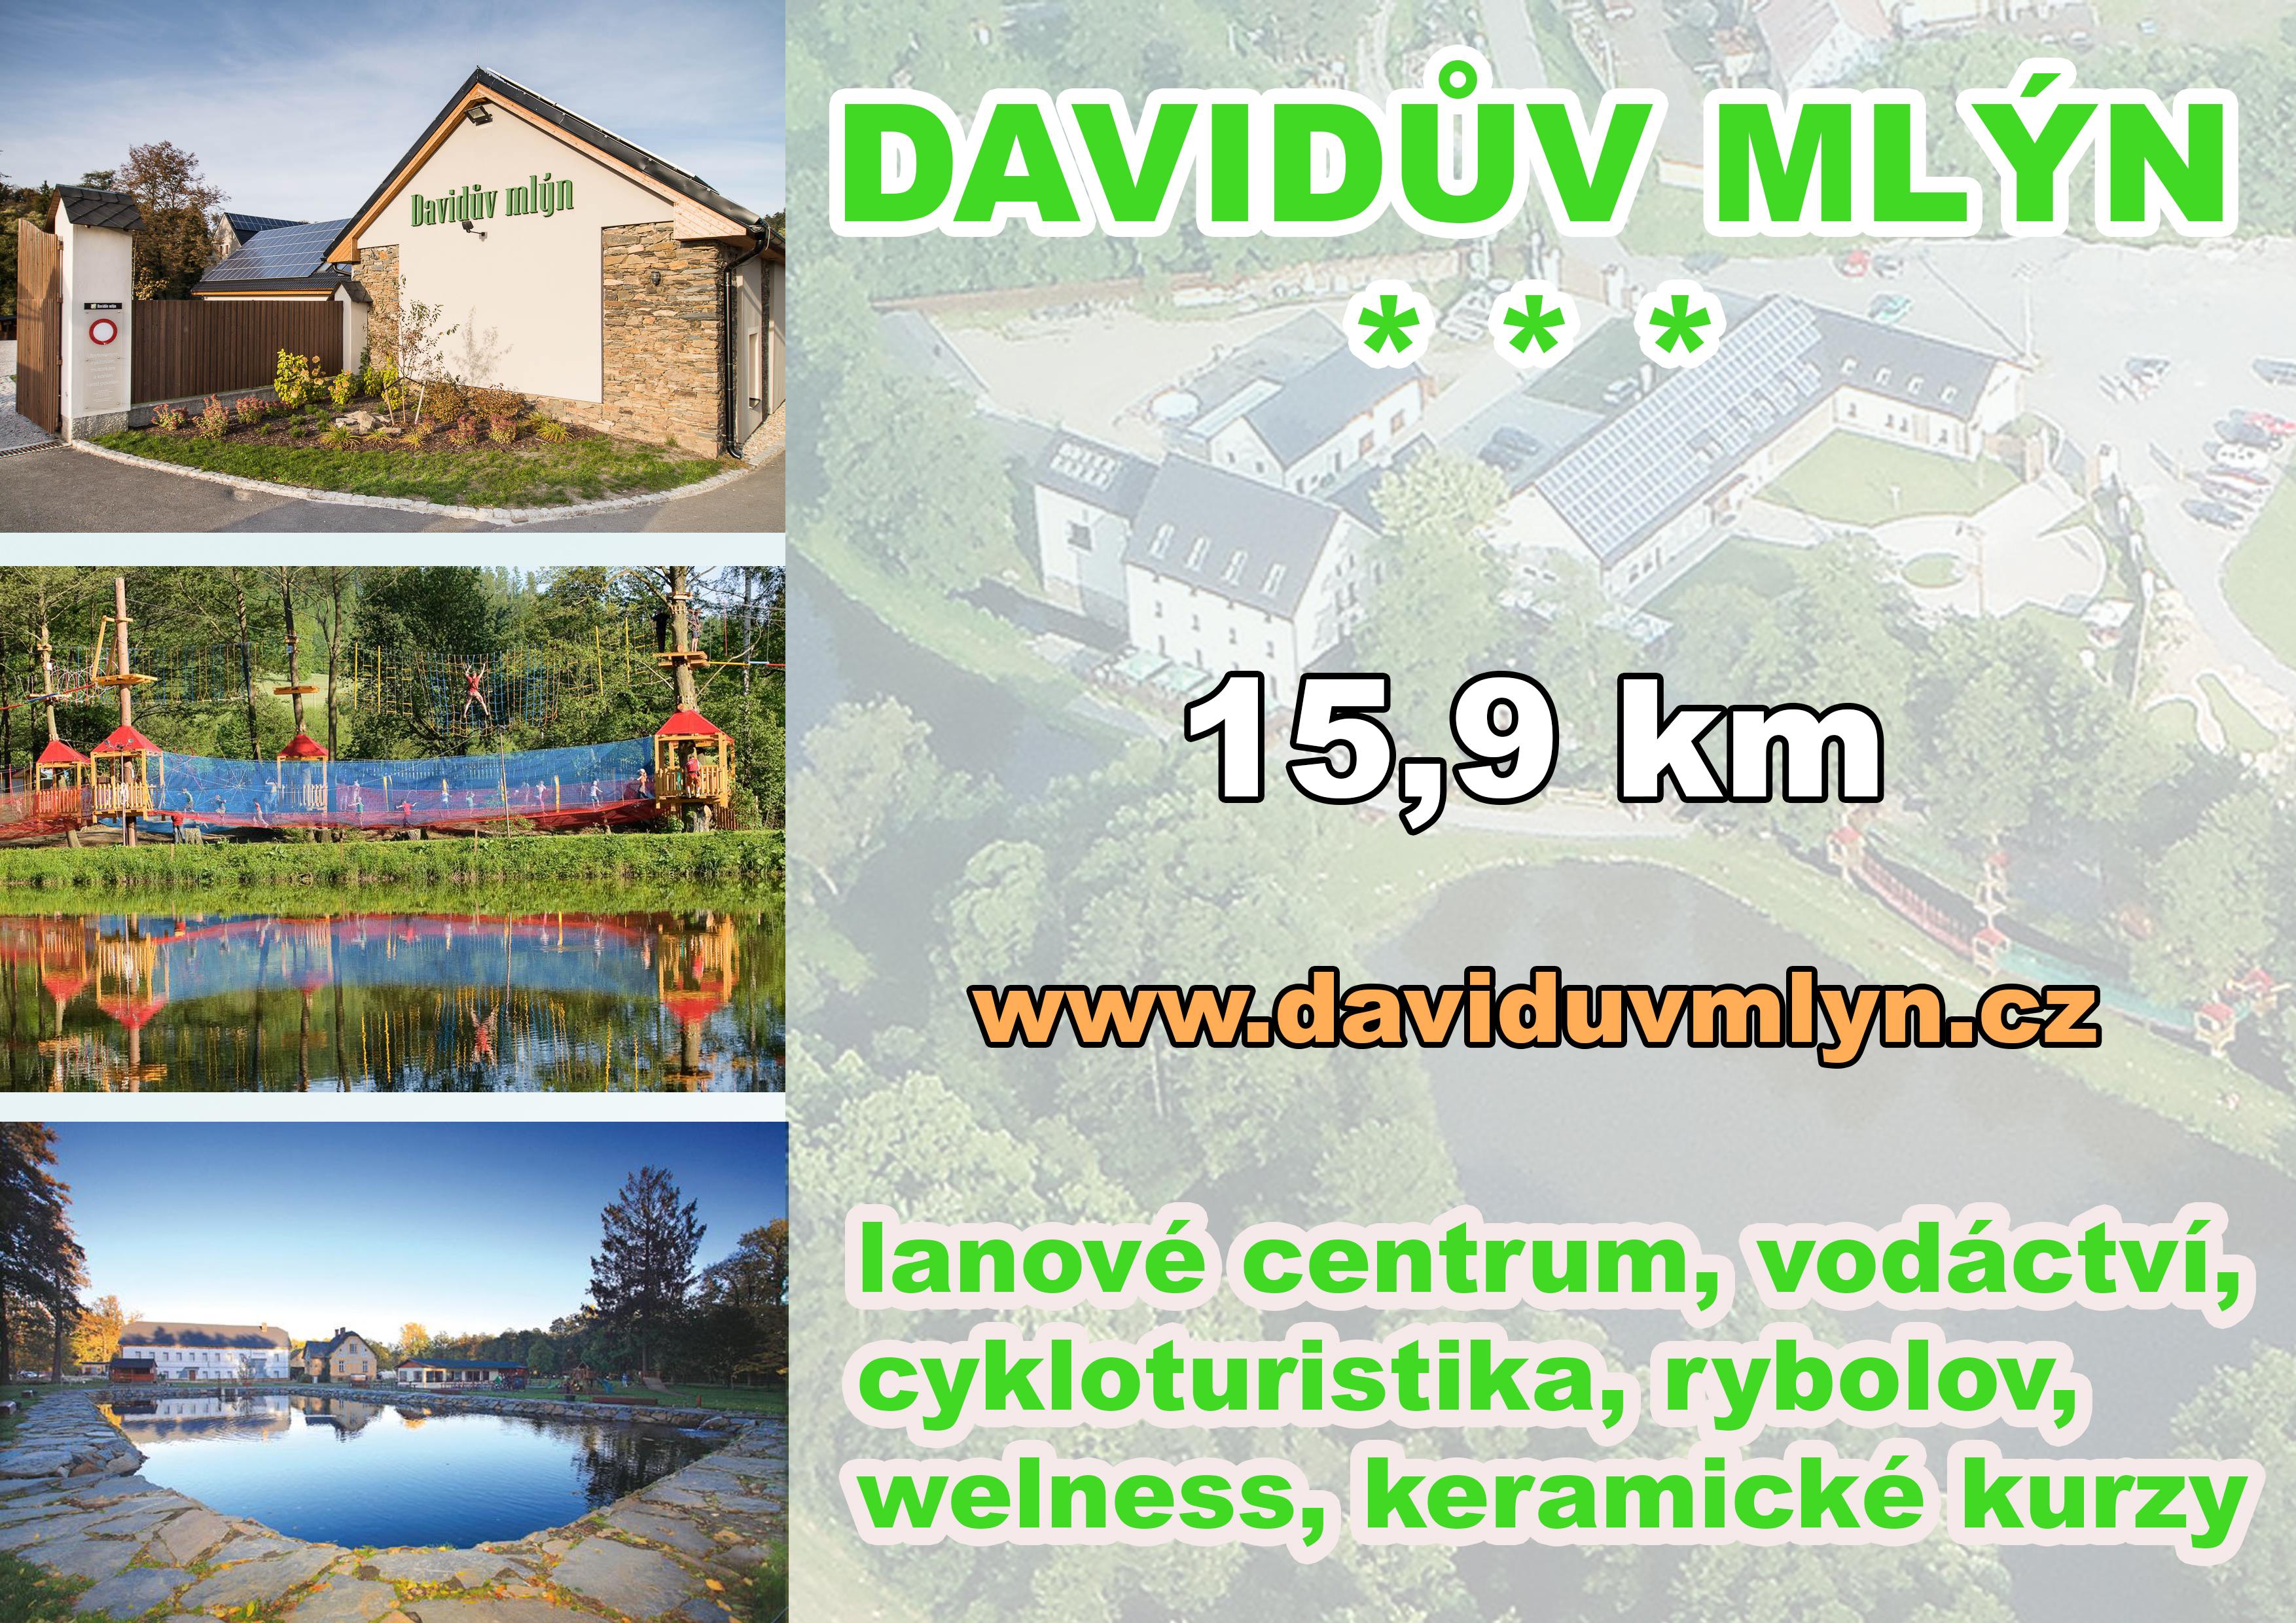 daviduv mlyn